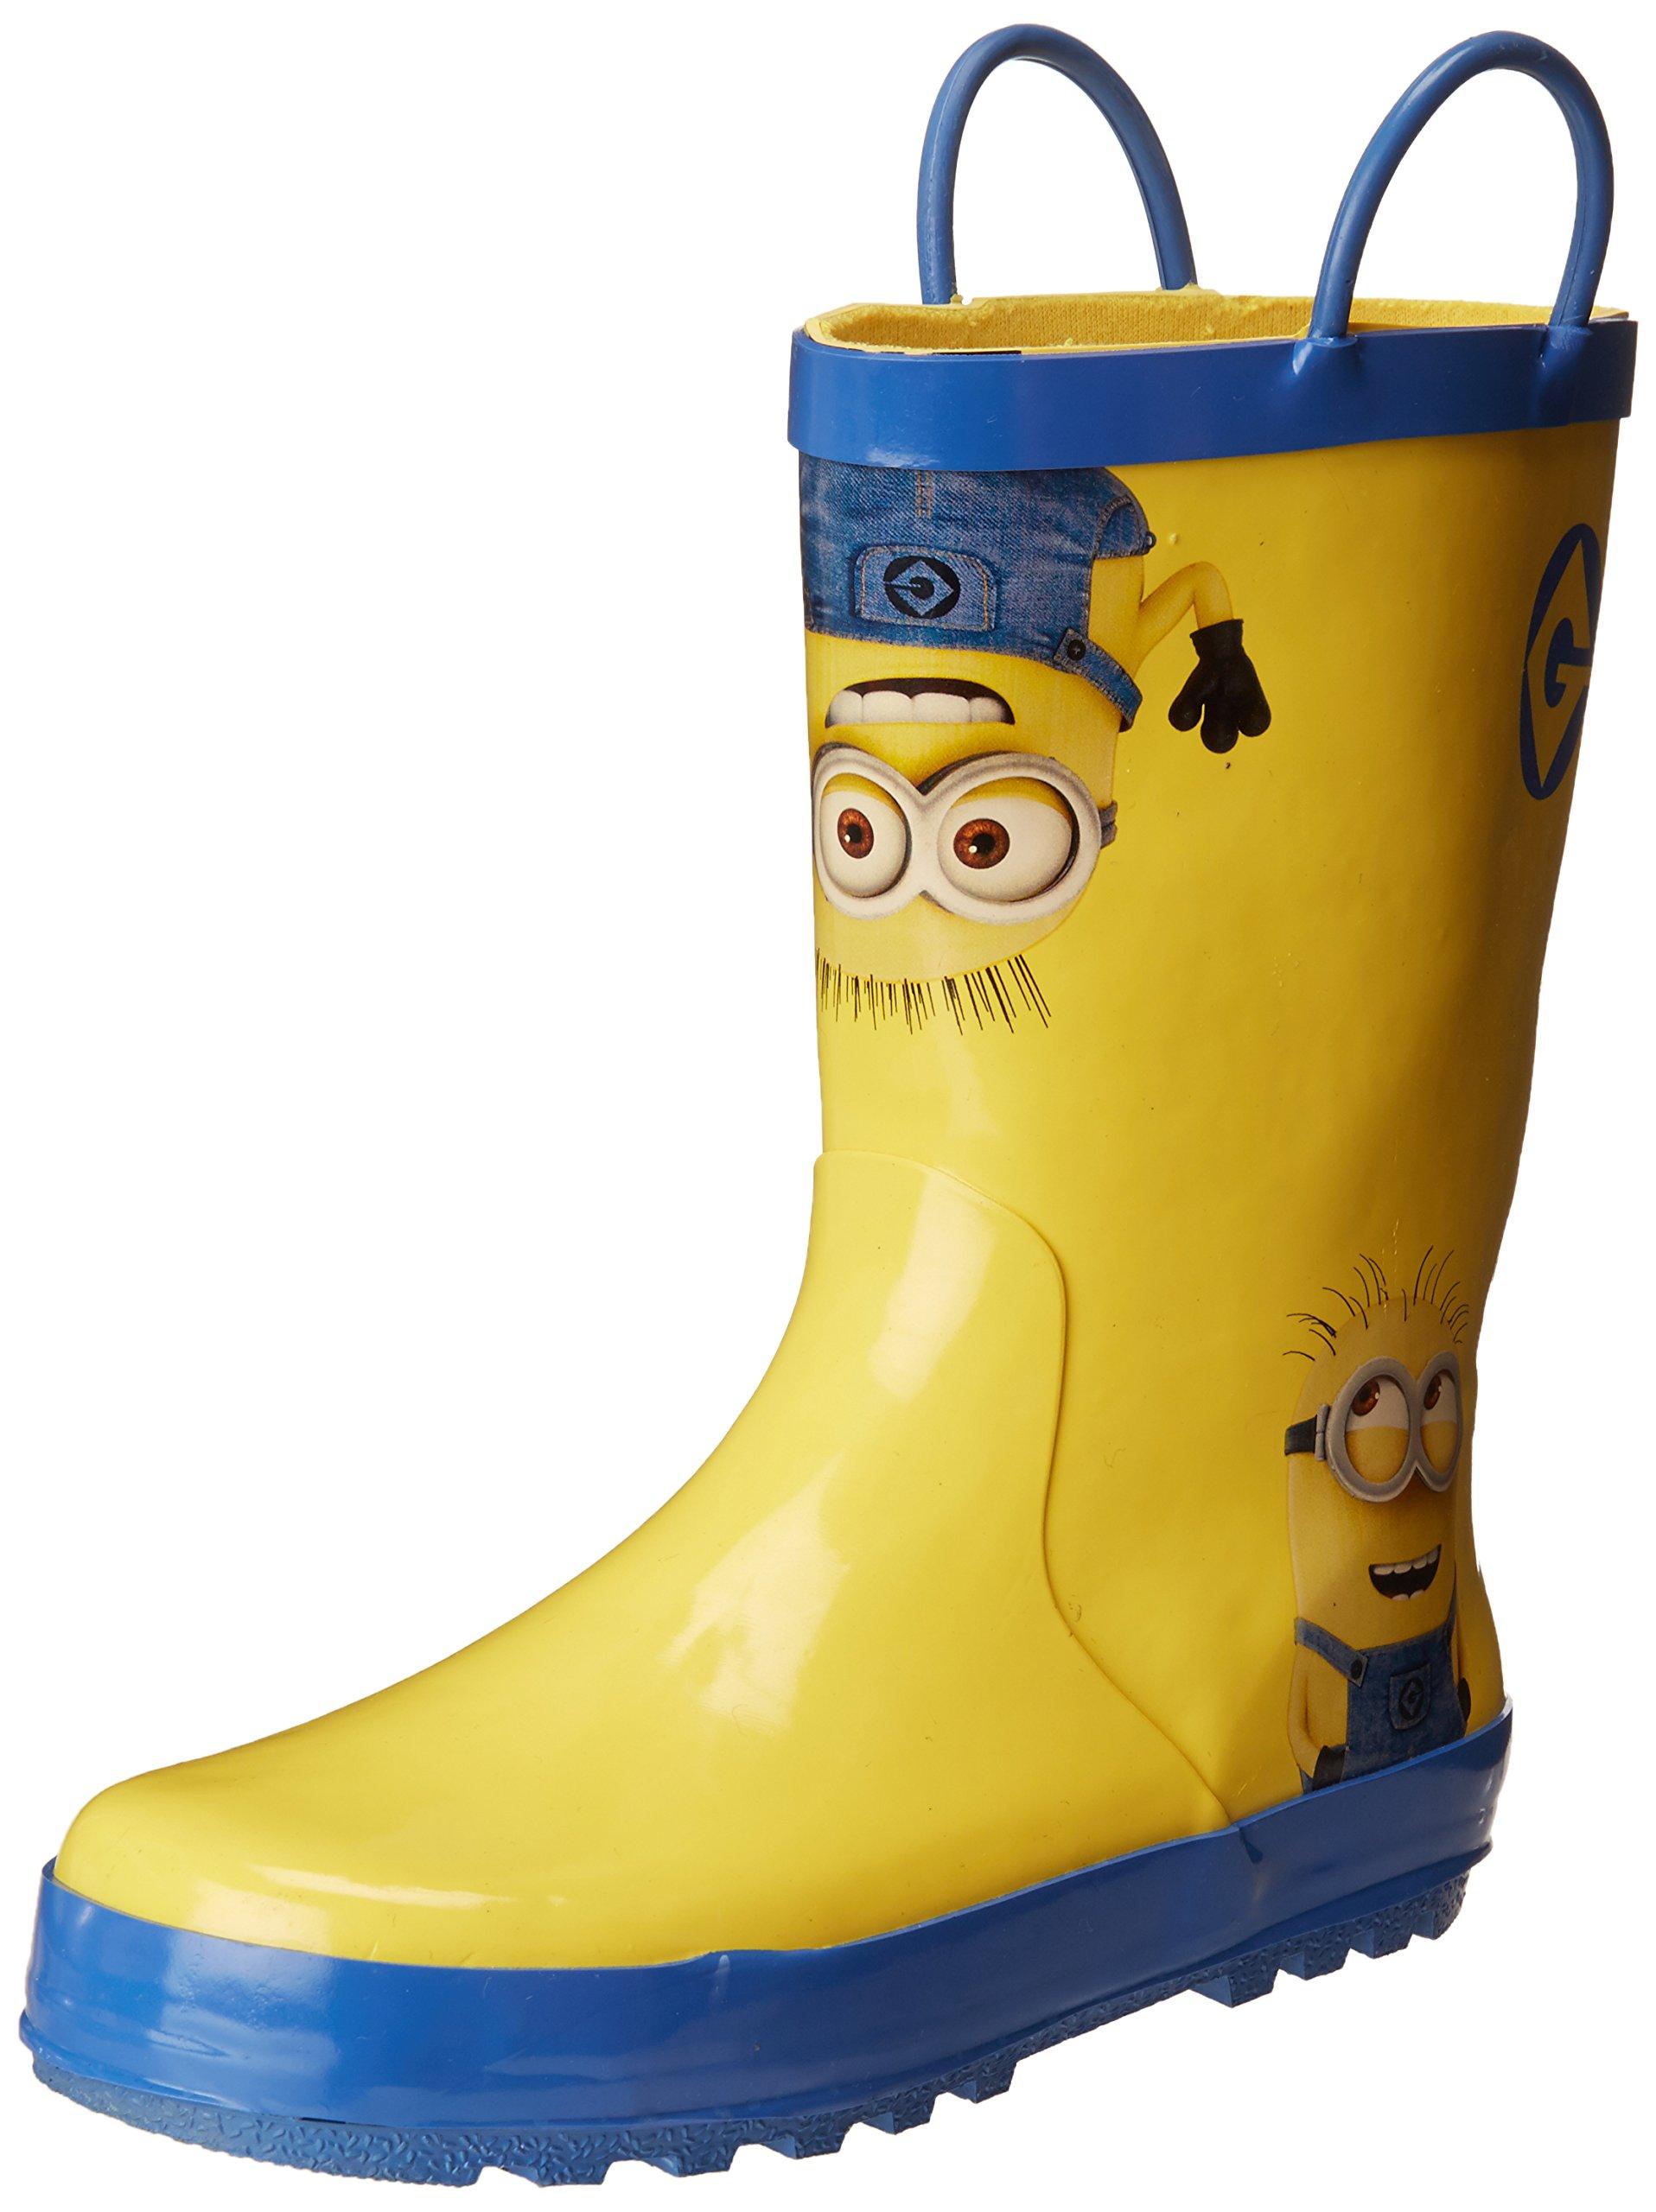 Despicable Me Unisex-Kids Minions Licensed Rain Boot, Yellow/Blue, Dual Shoe Size 13/1 Child US Little Kid